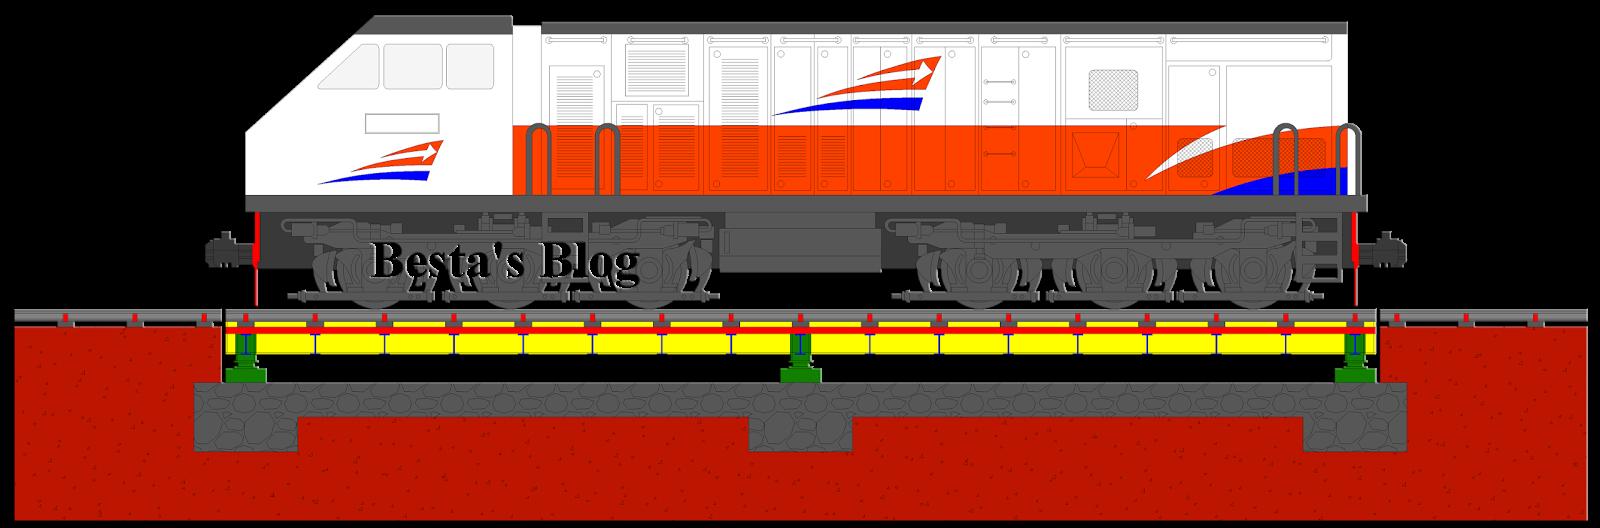 Besta's Blog: Jembatan Timbang Kereta Api (Train Scale)